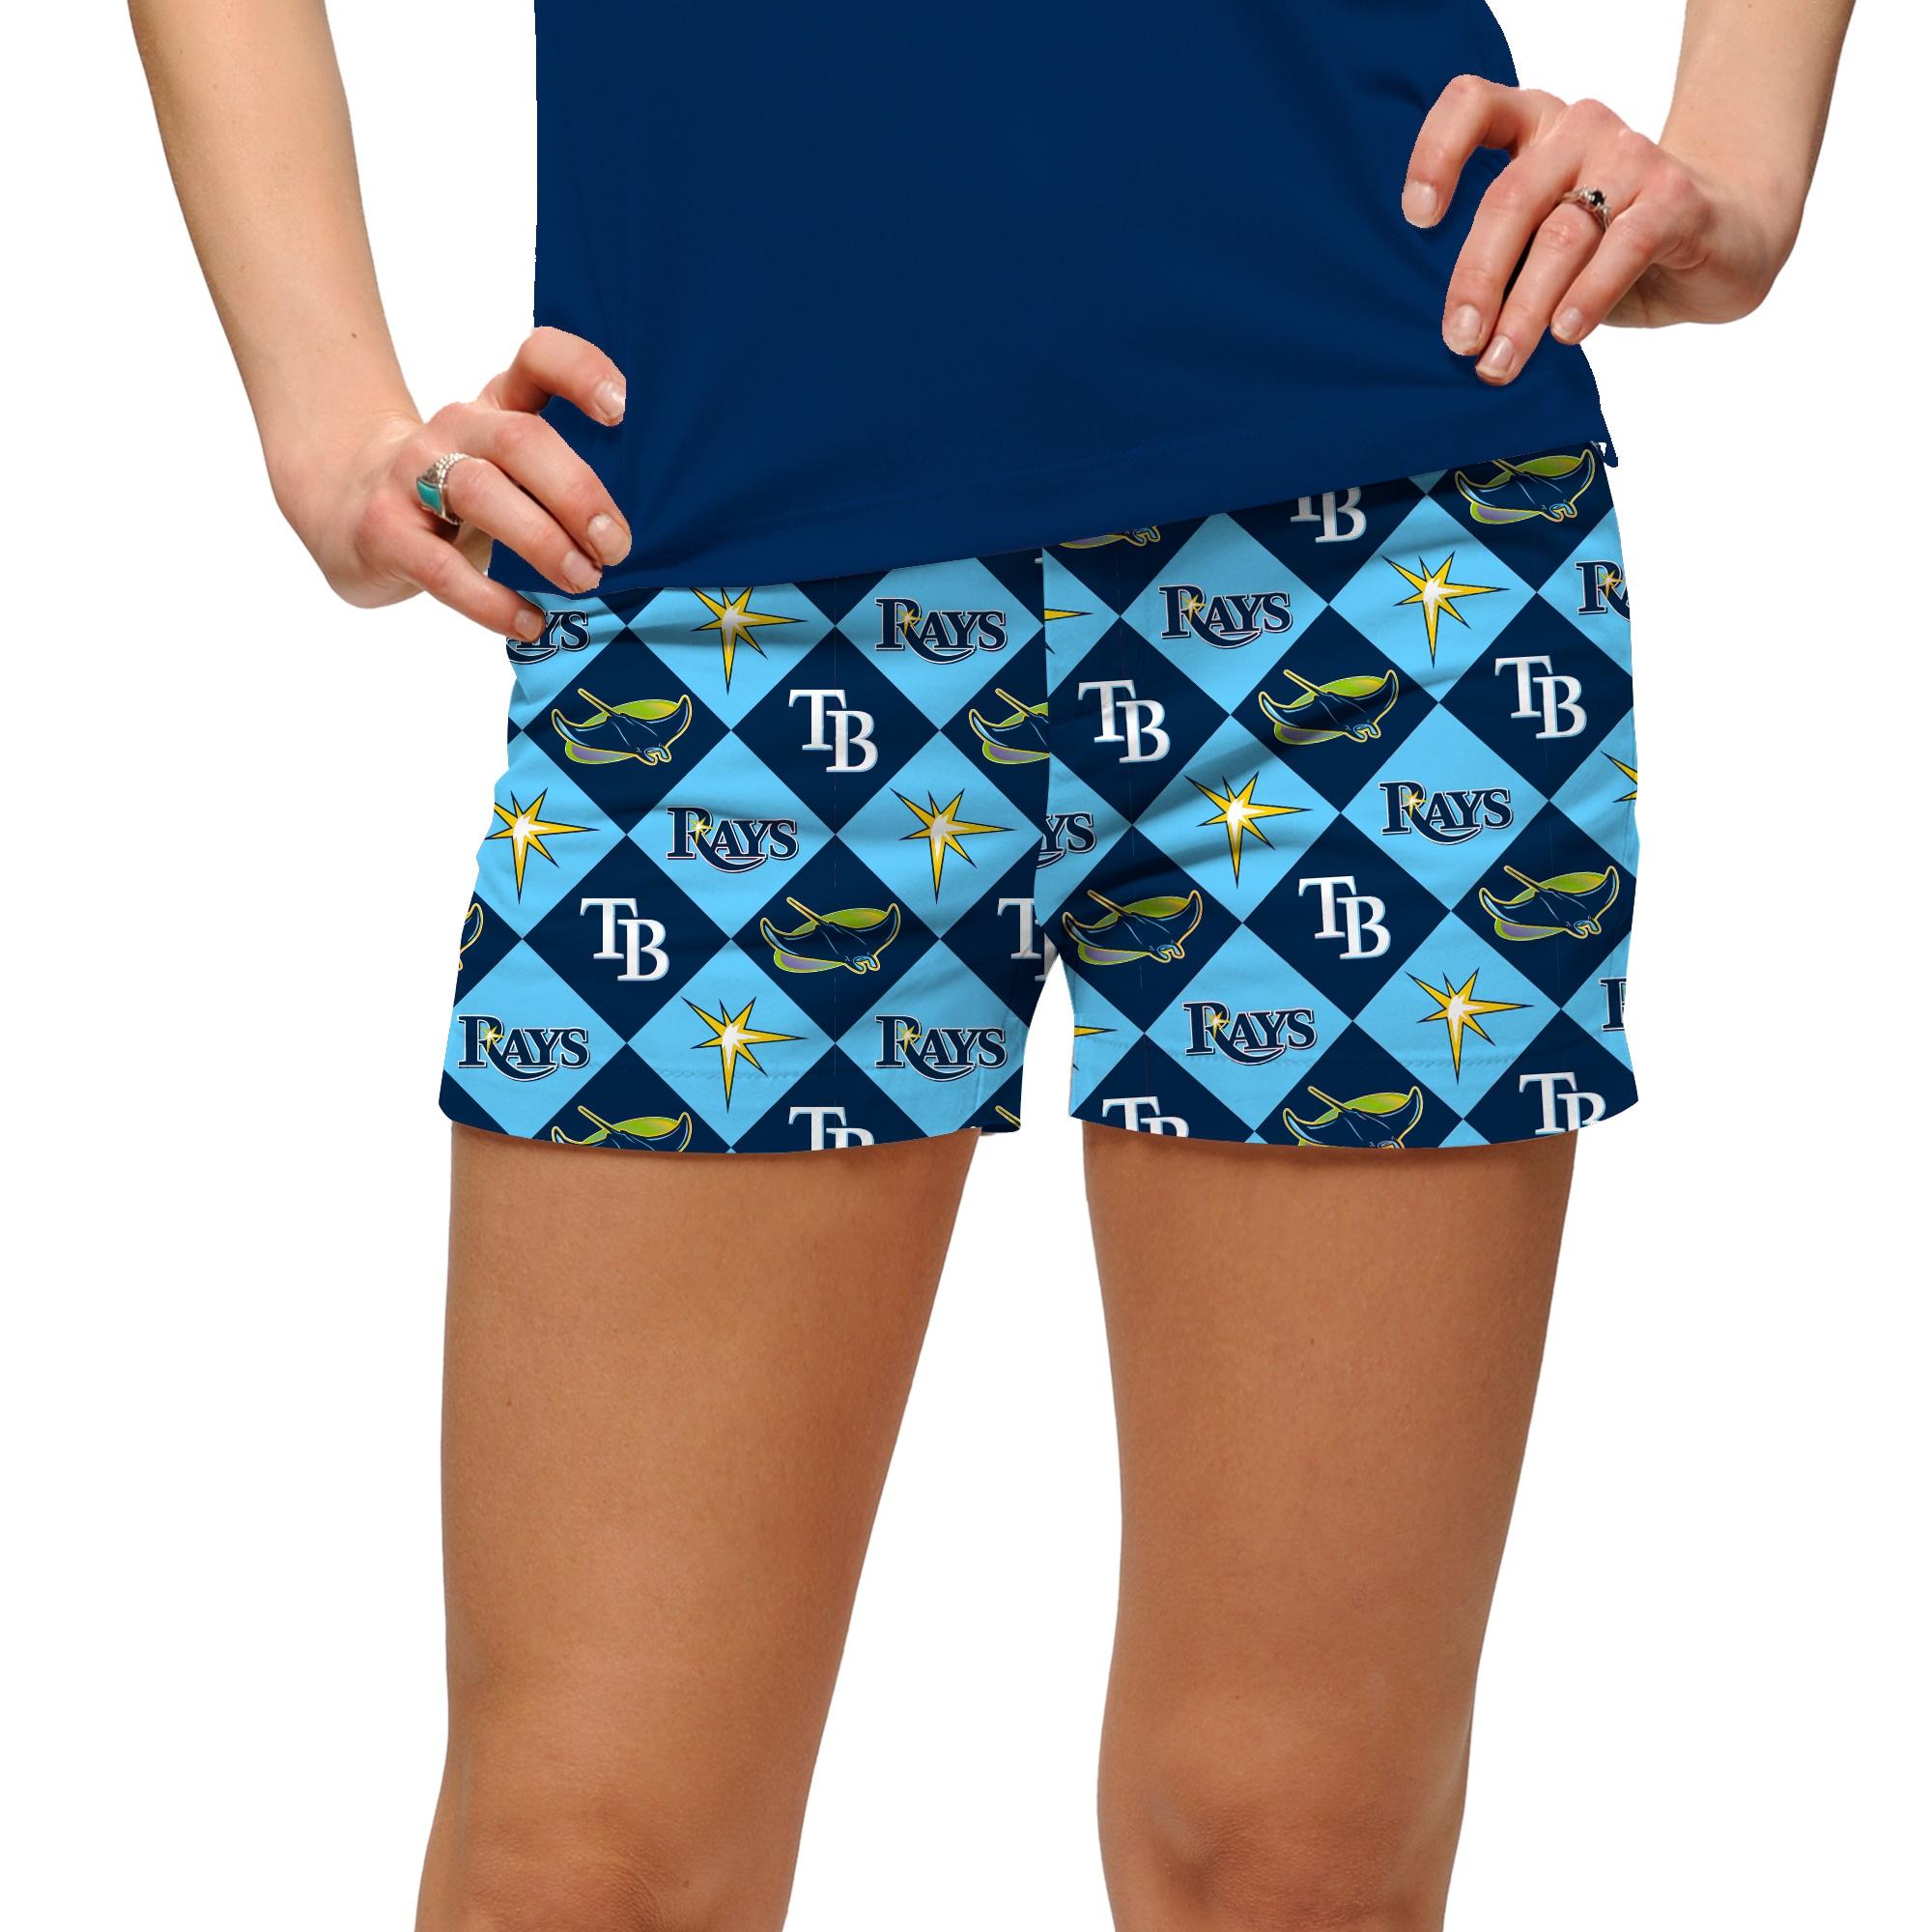 Tampa Bay Rays Loudmouth Women's Mini Shorts - Navy